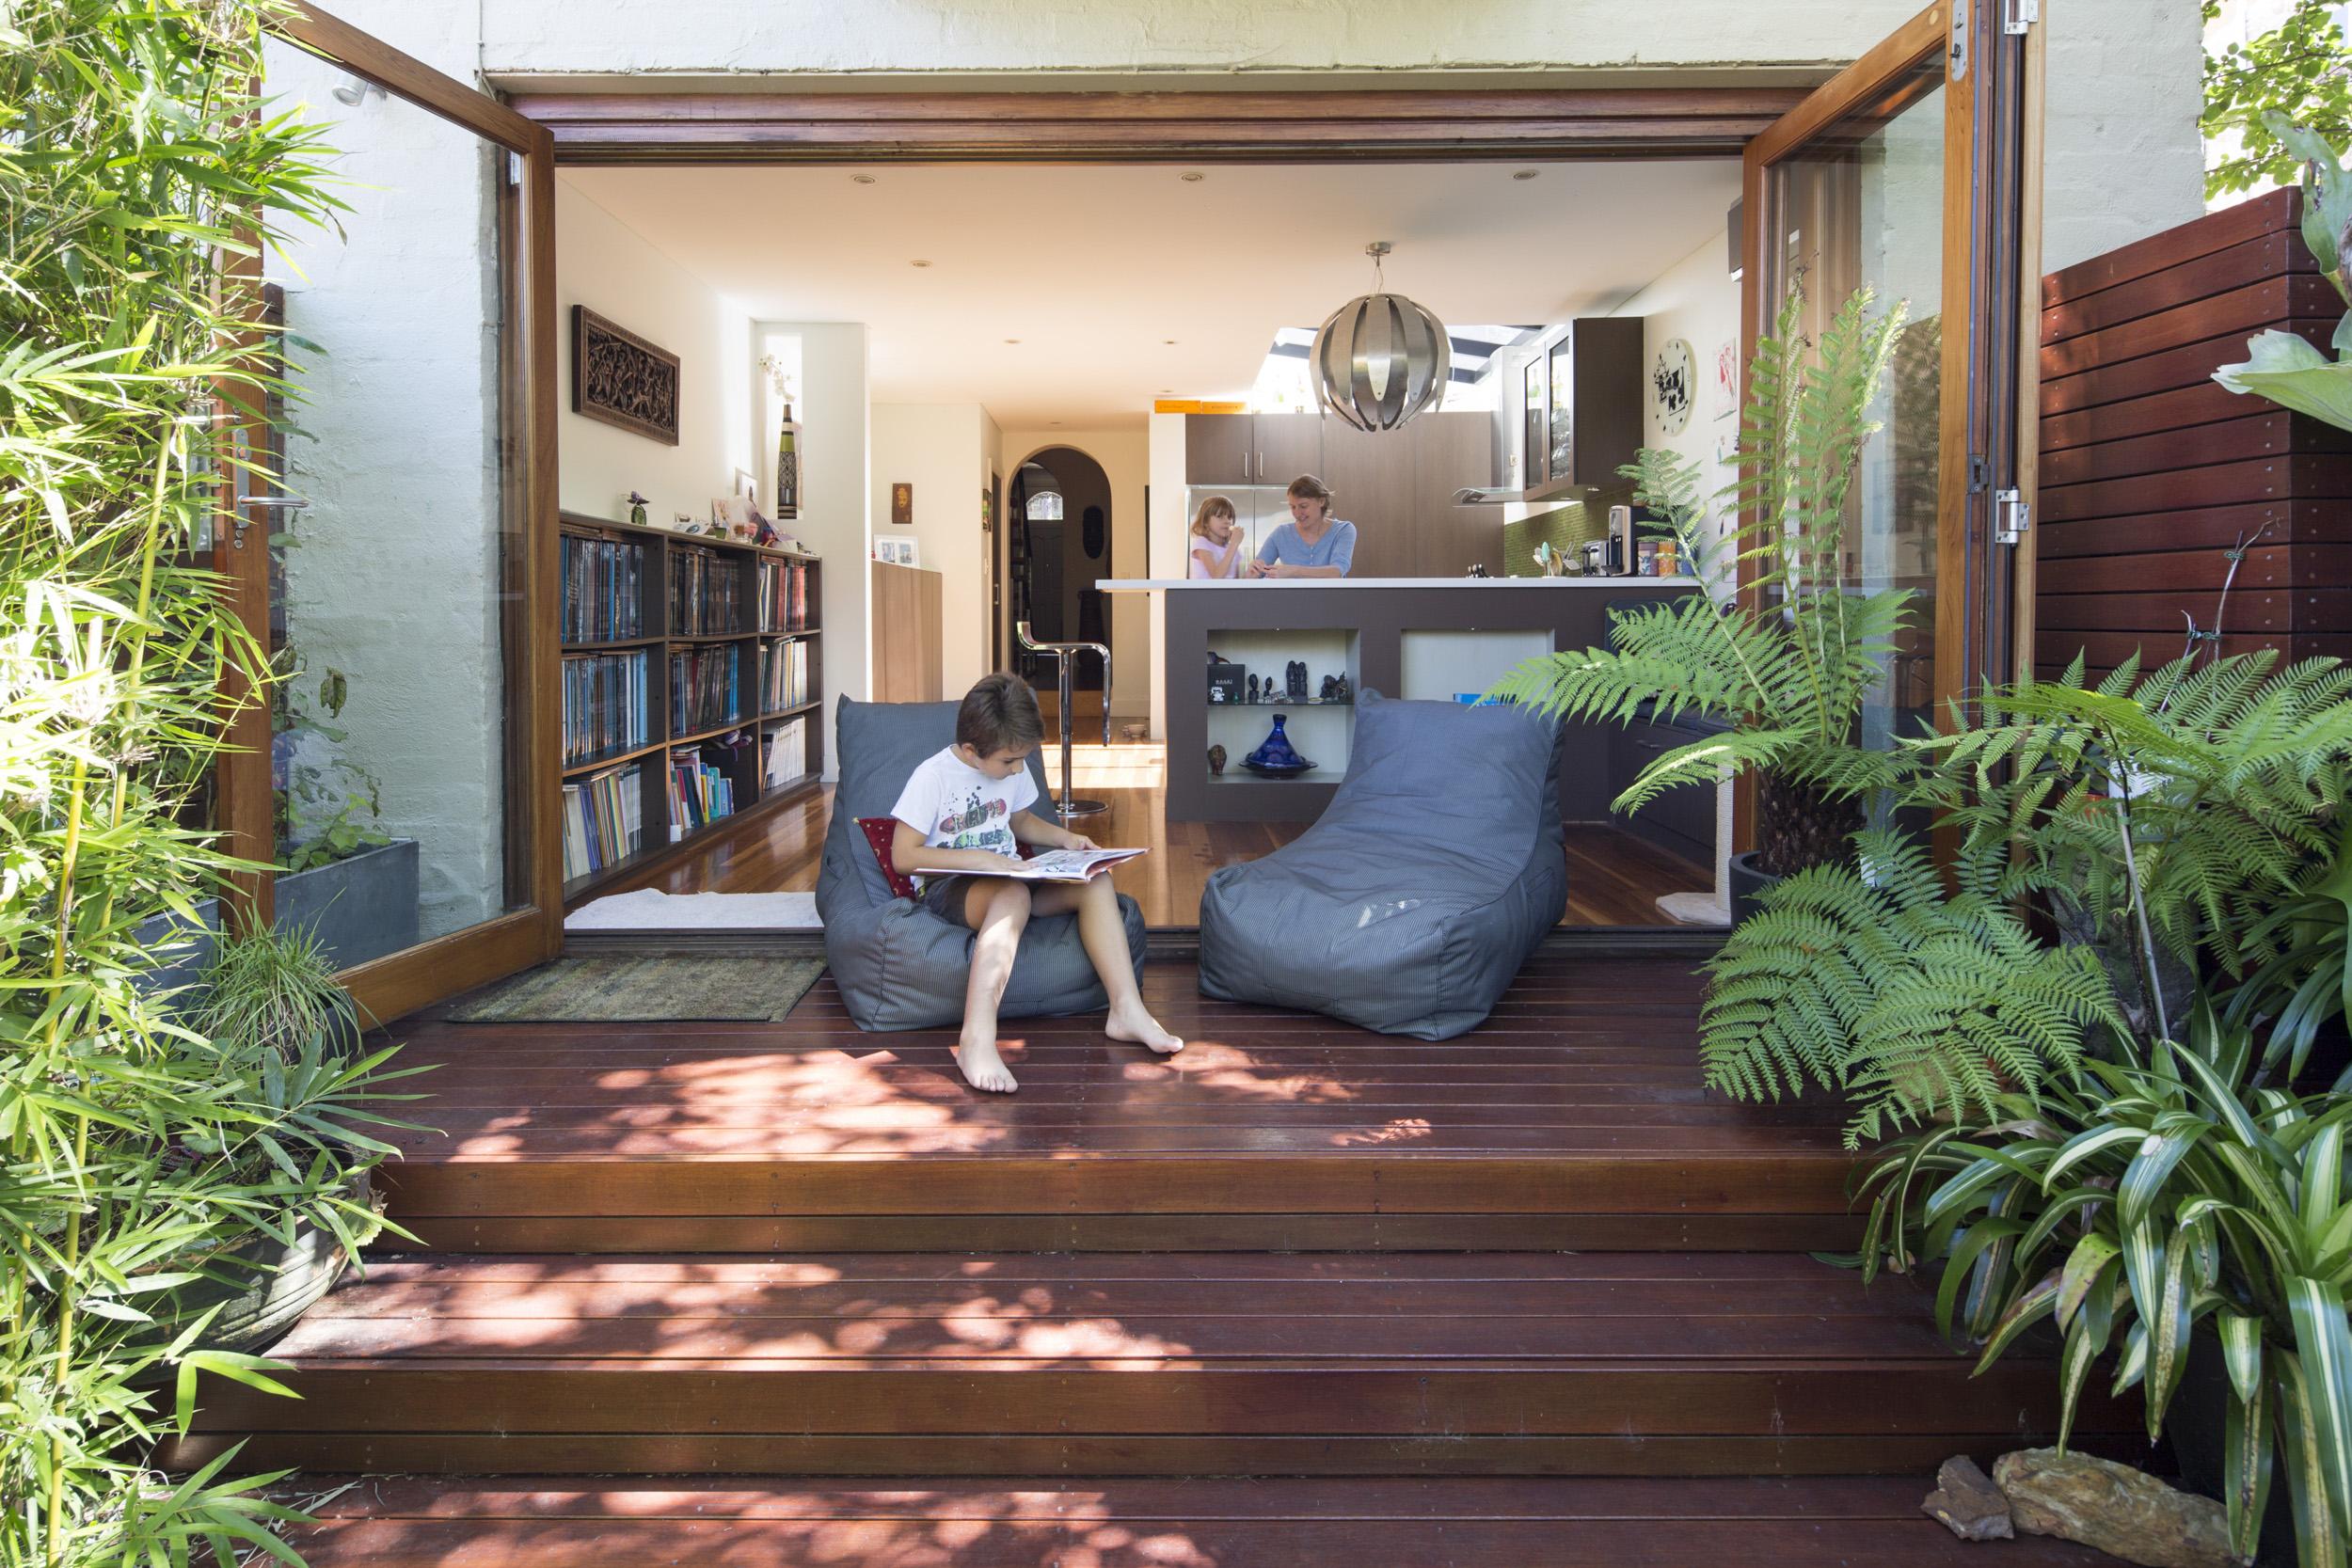 residential_architecture_sydney_australia_13.jpg